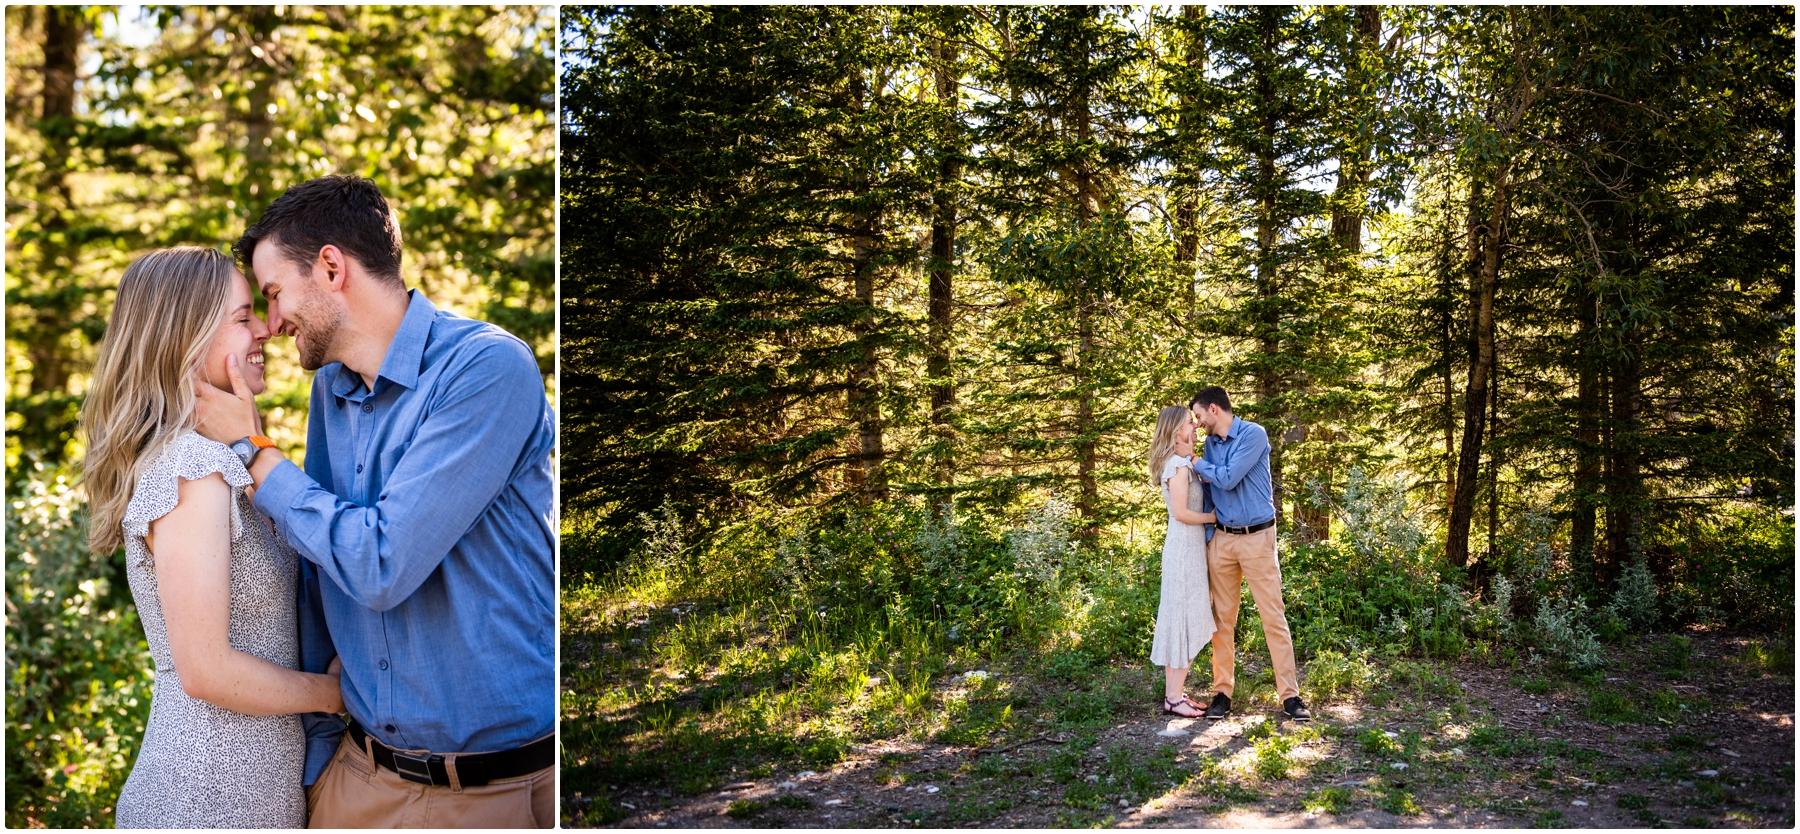 Kananaskis Engagement Photography - Allen Bill Day Use